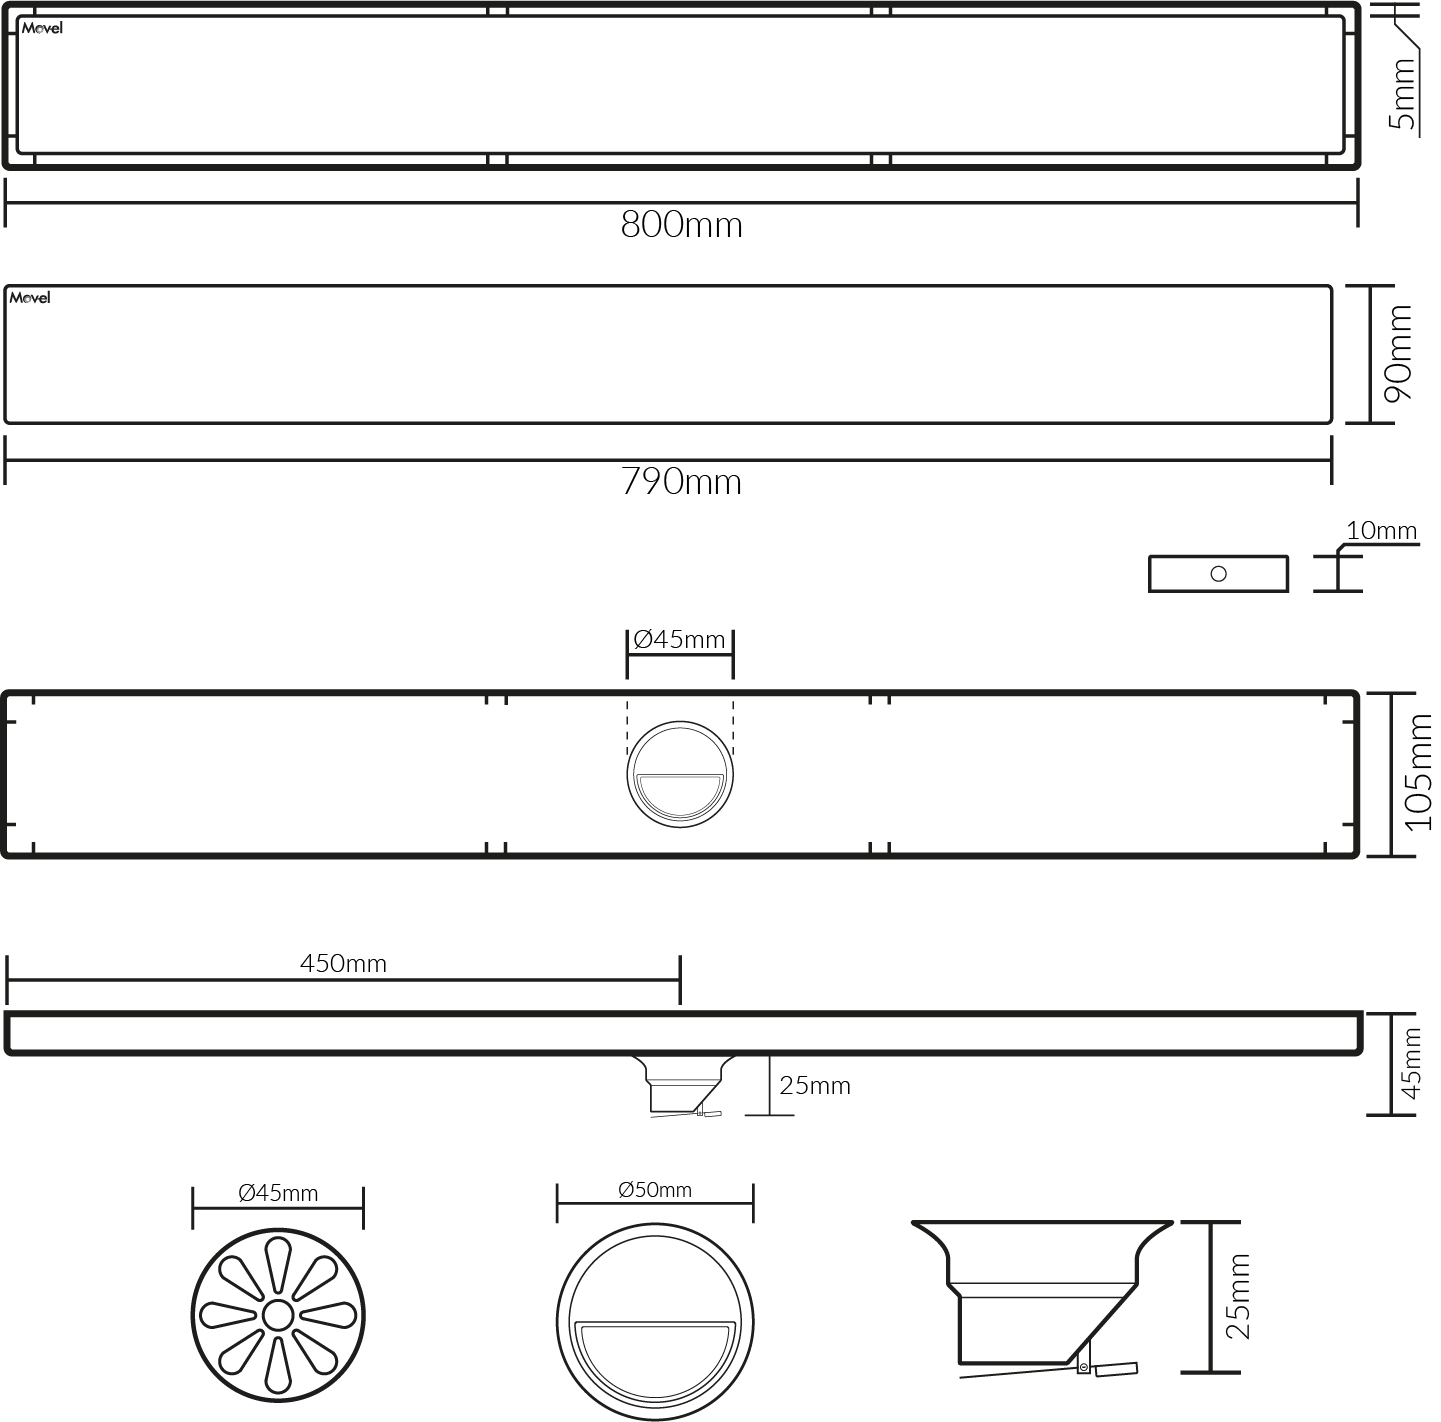 Ralo Linear Fechamento Automático Preto Fosco 80x10cm